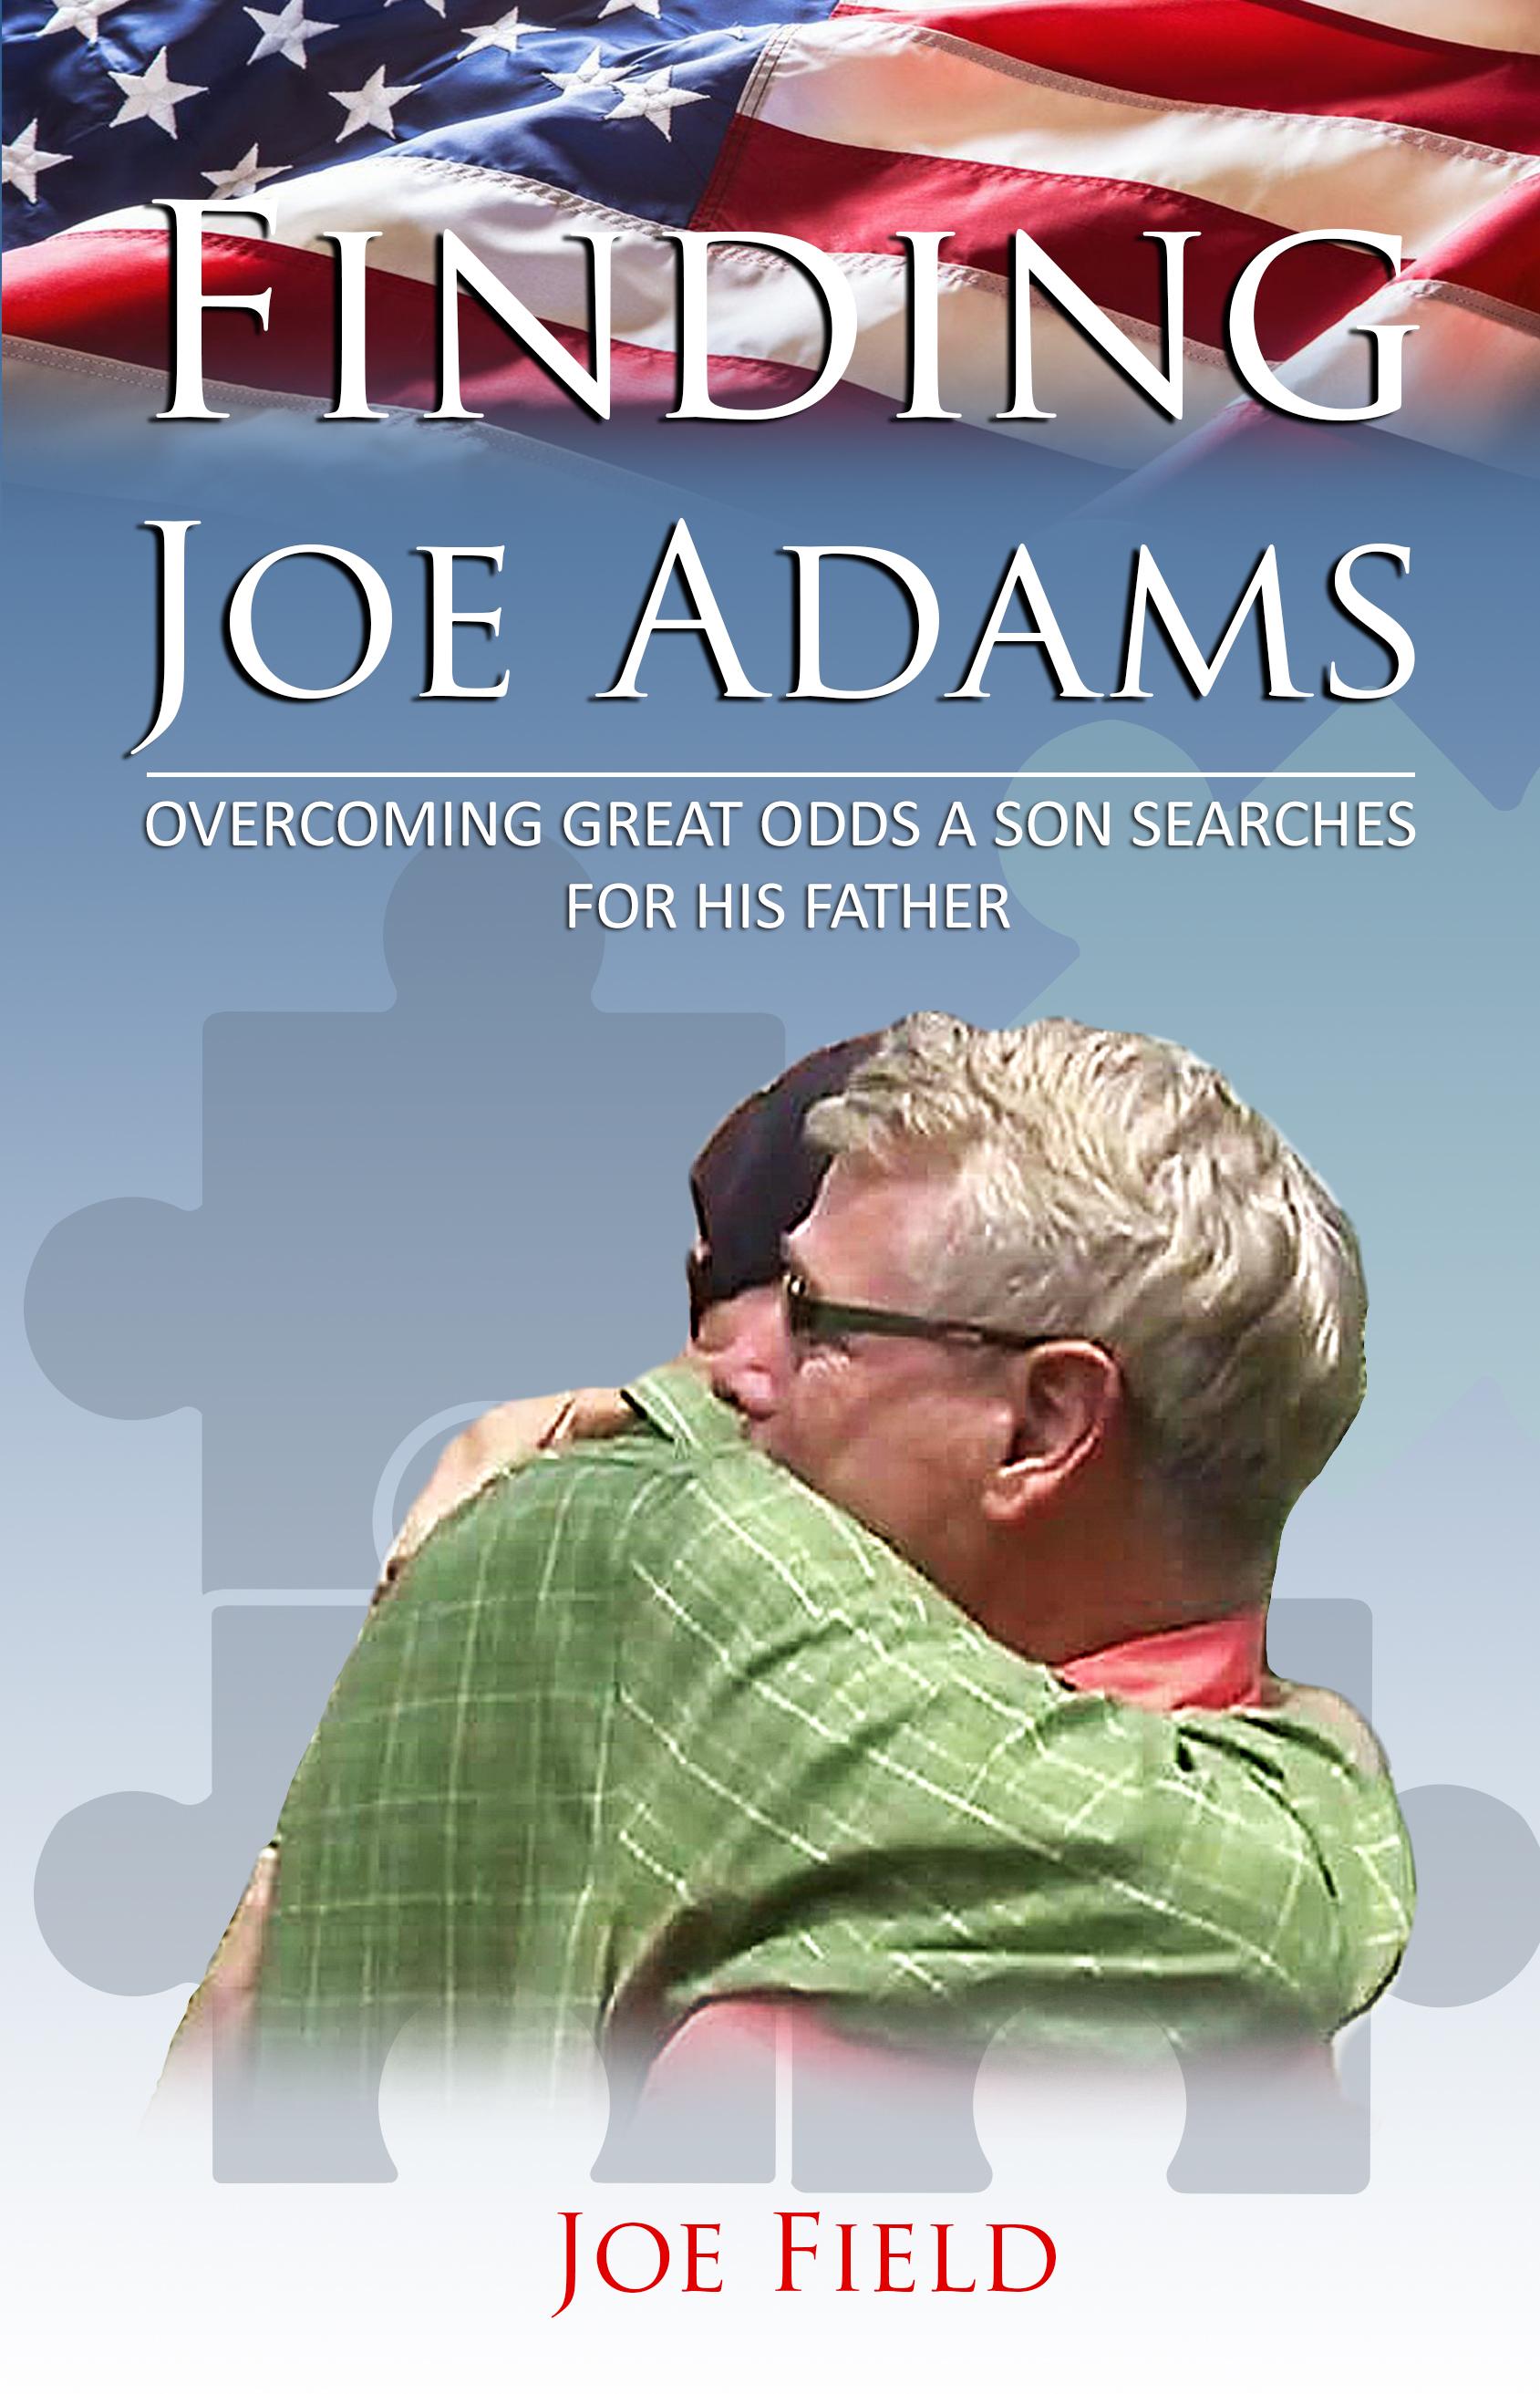 Find Joe Adams